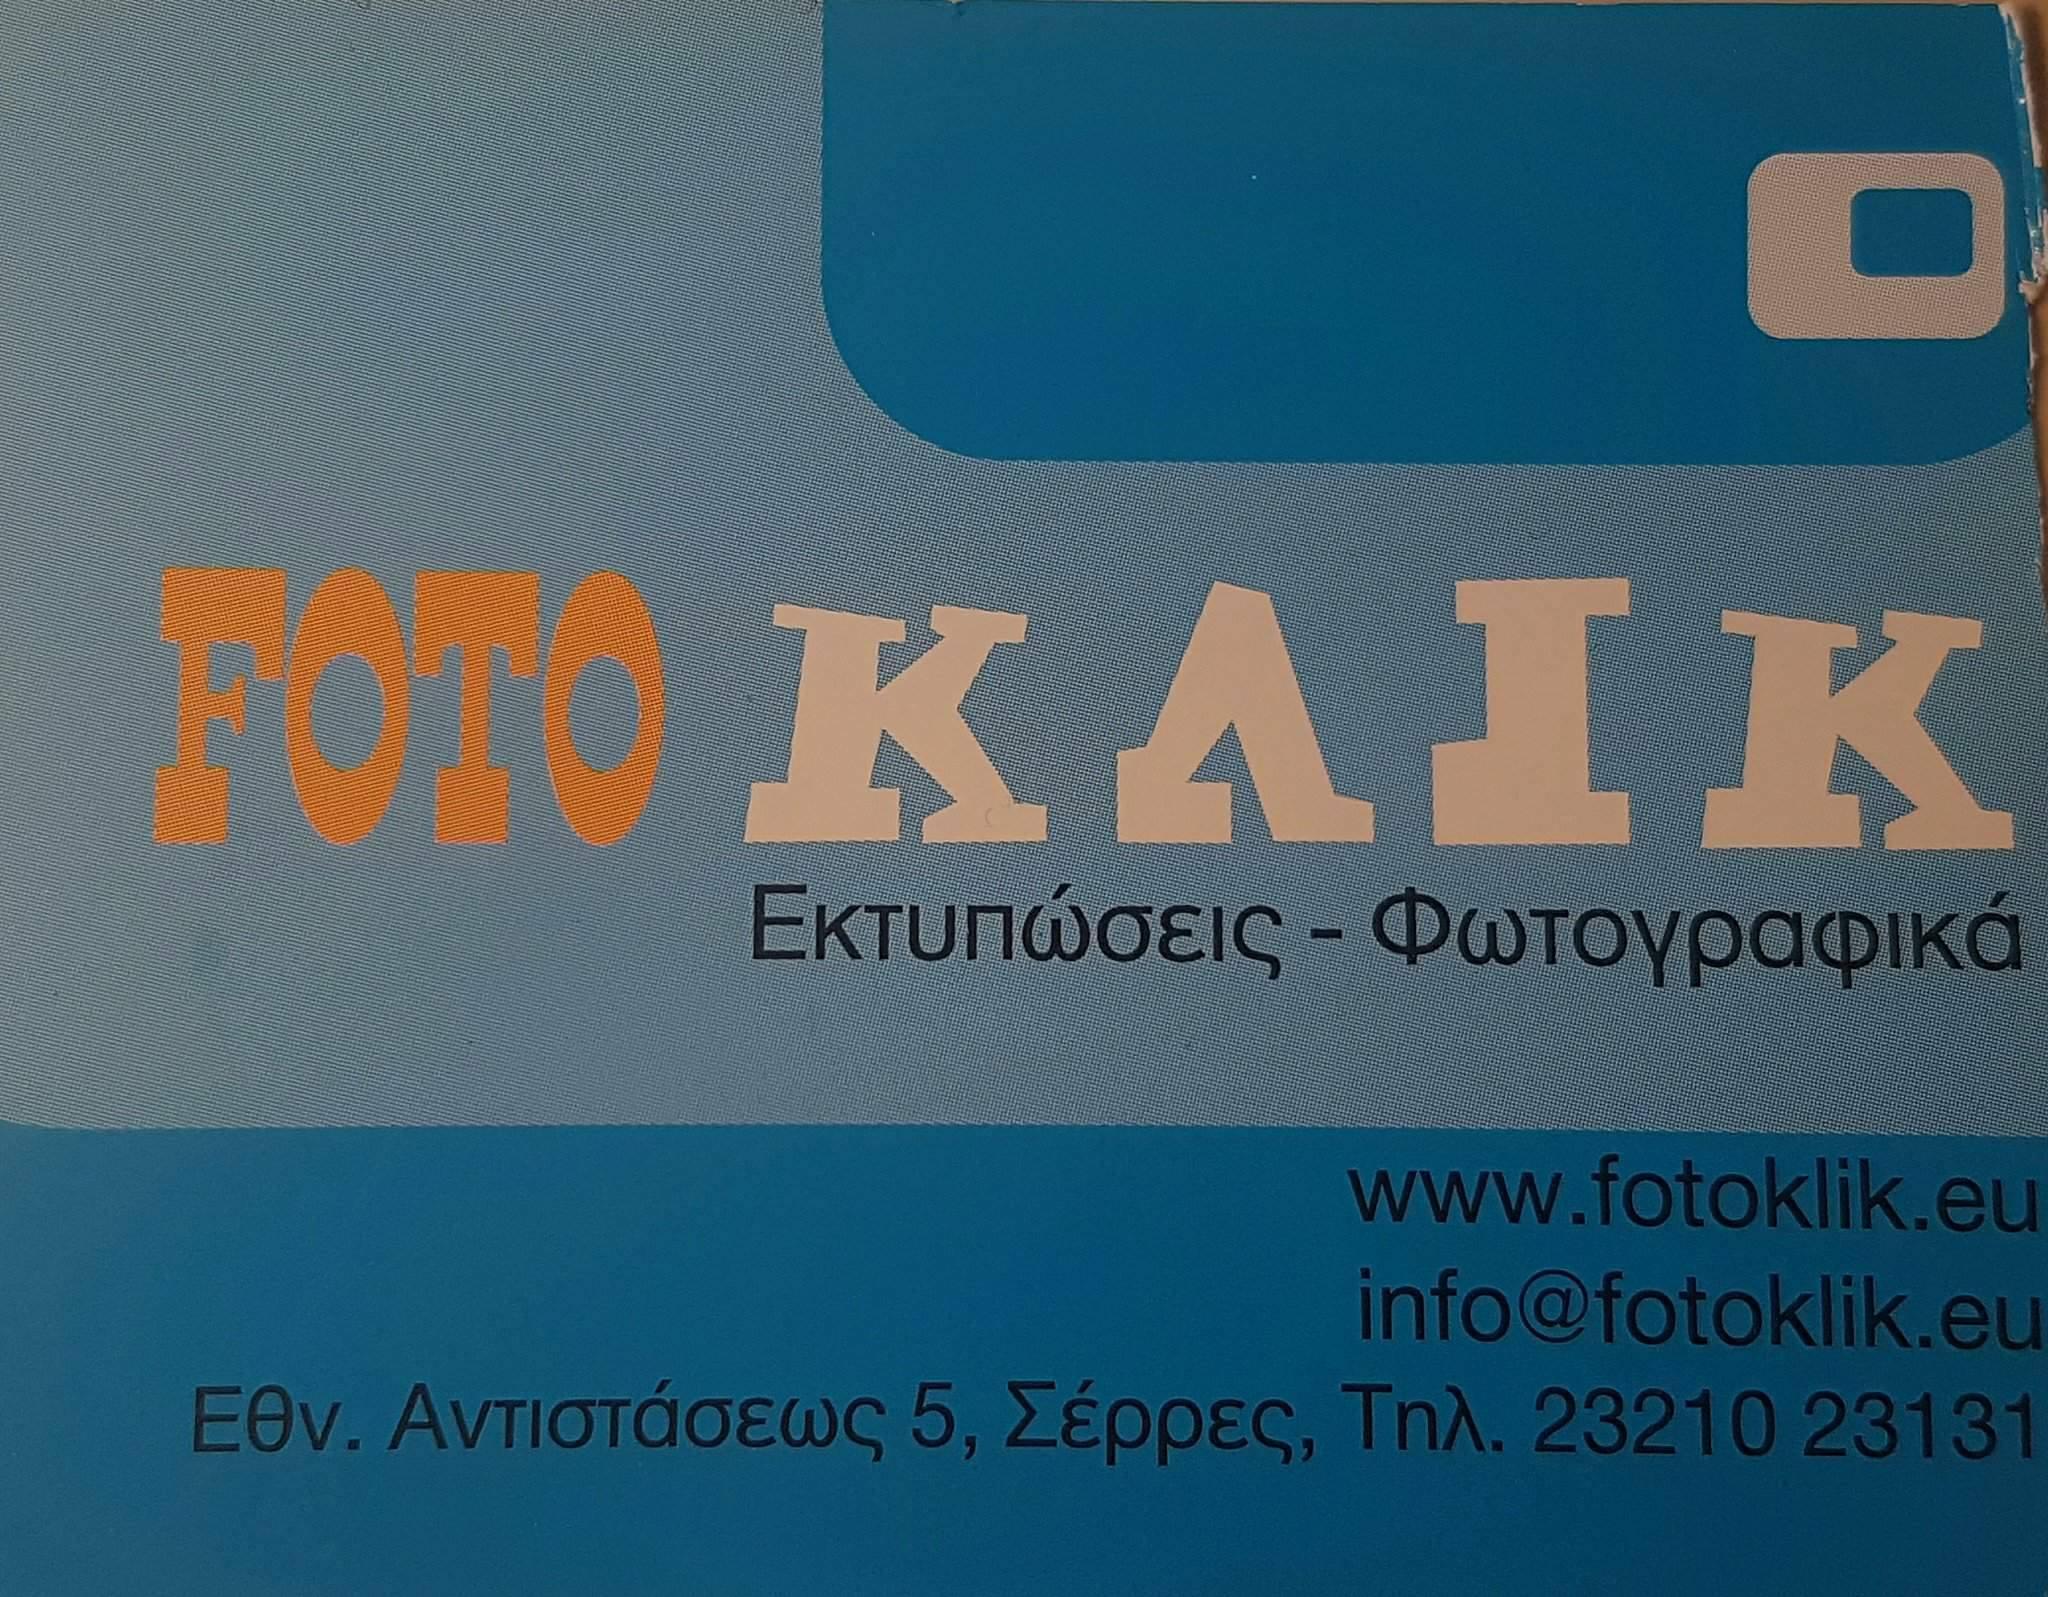 22251362_10155732348923119_238839506_o